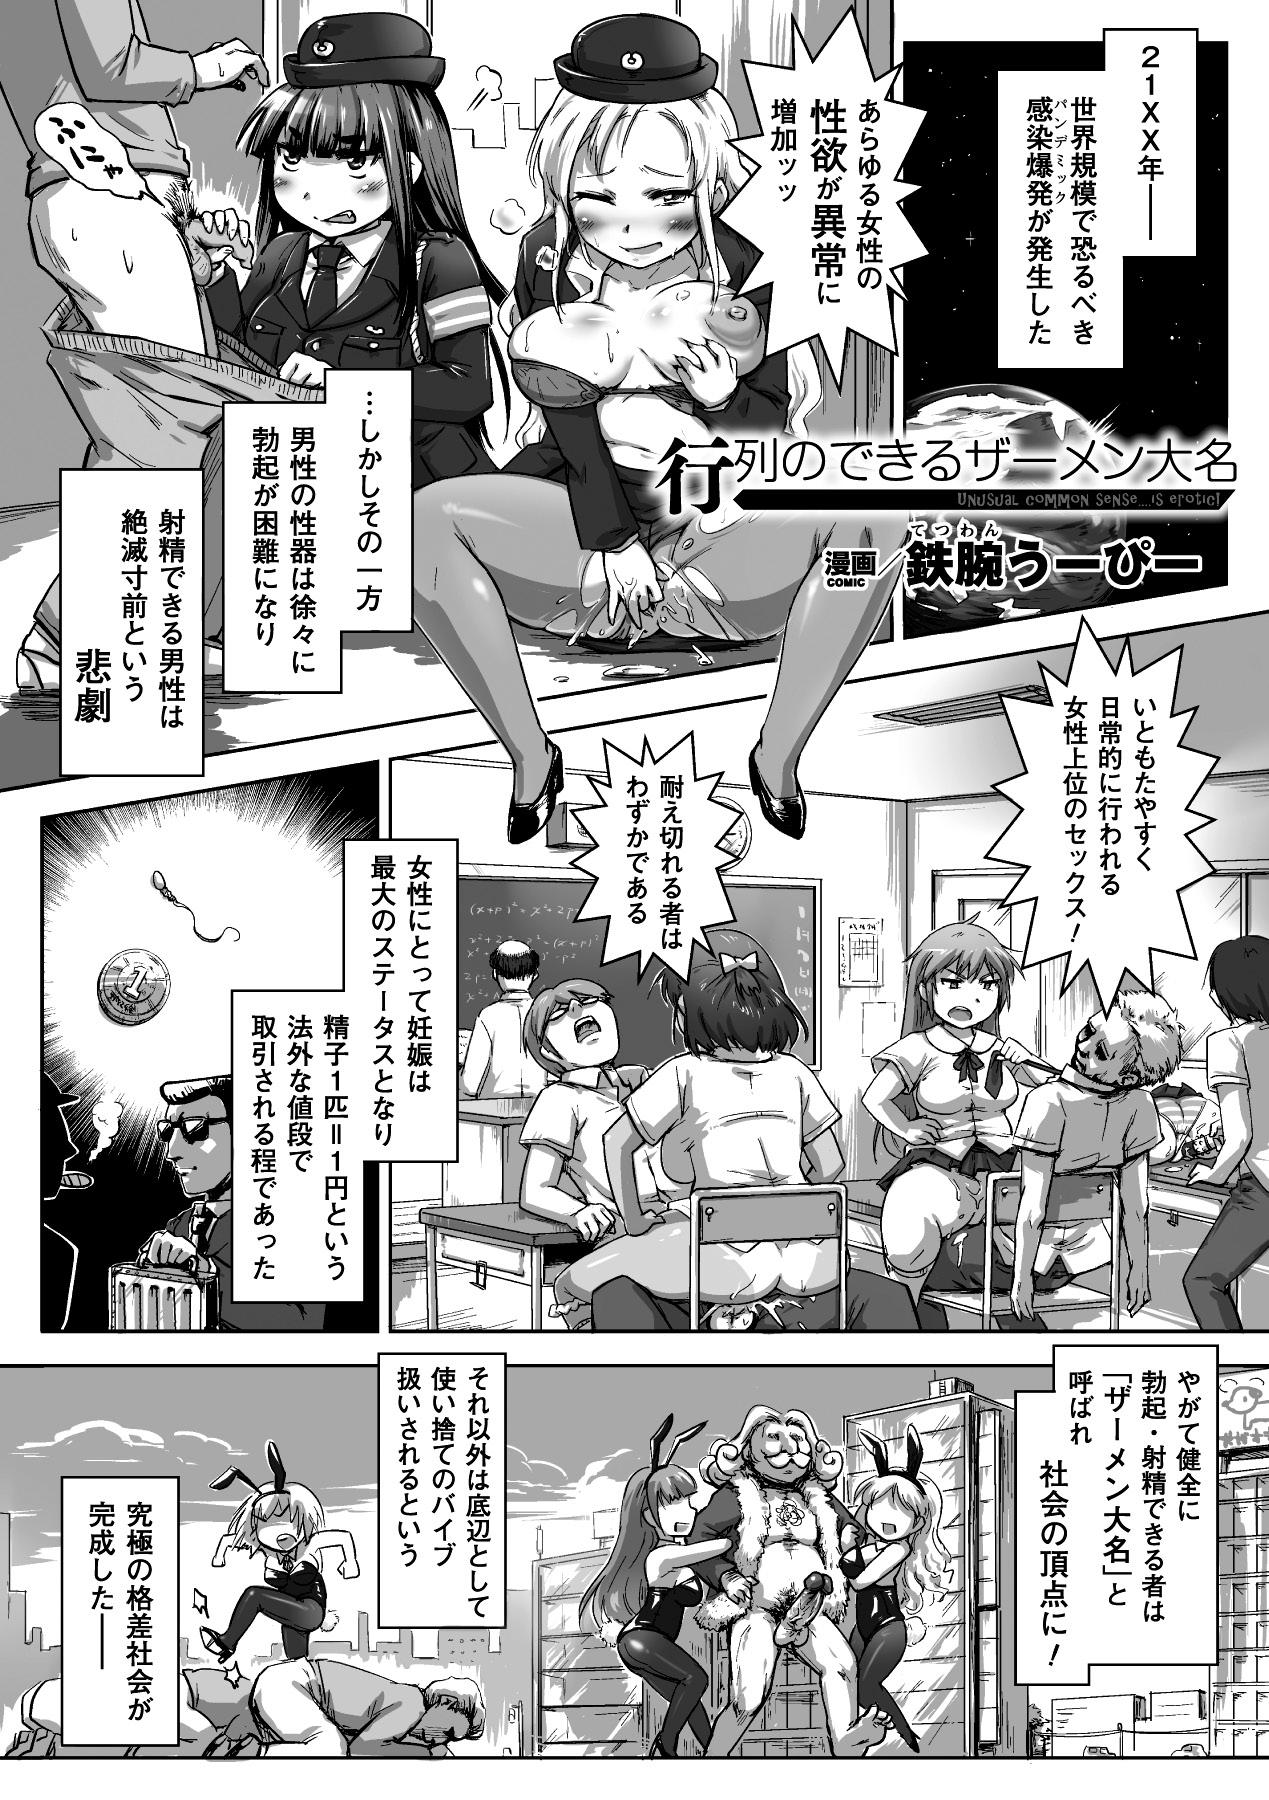 Bessatsu Comic Unreal - Joushiki ga Eroi Ijou na Sekai Vol.2 32